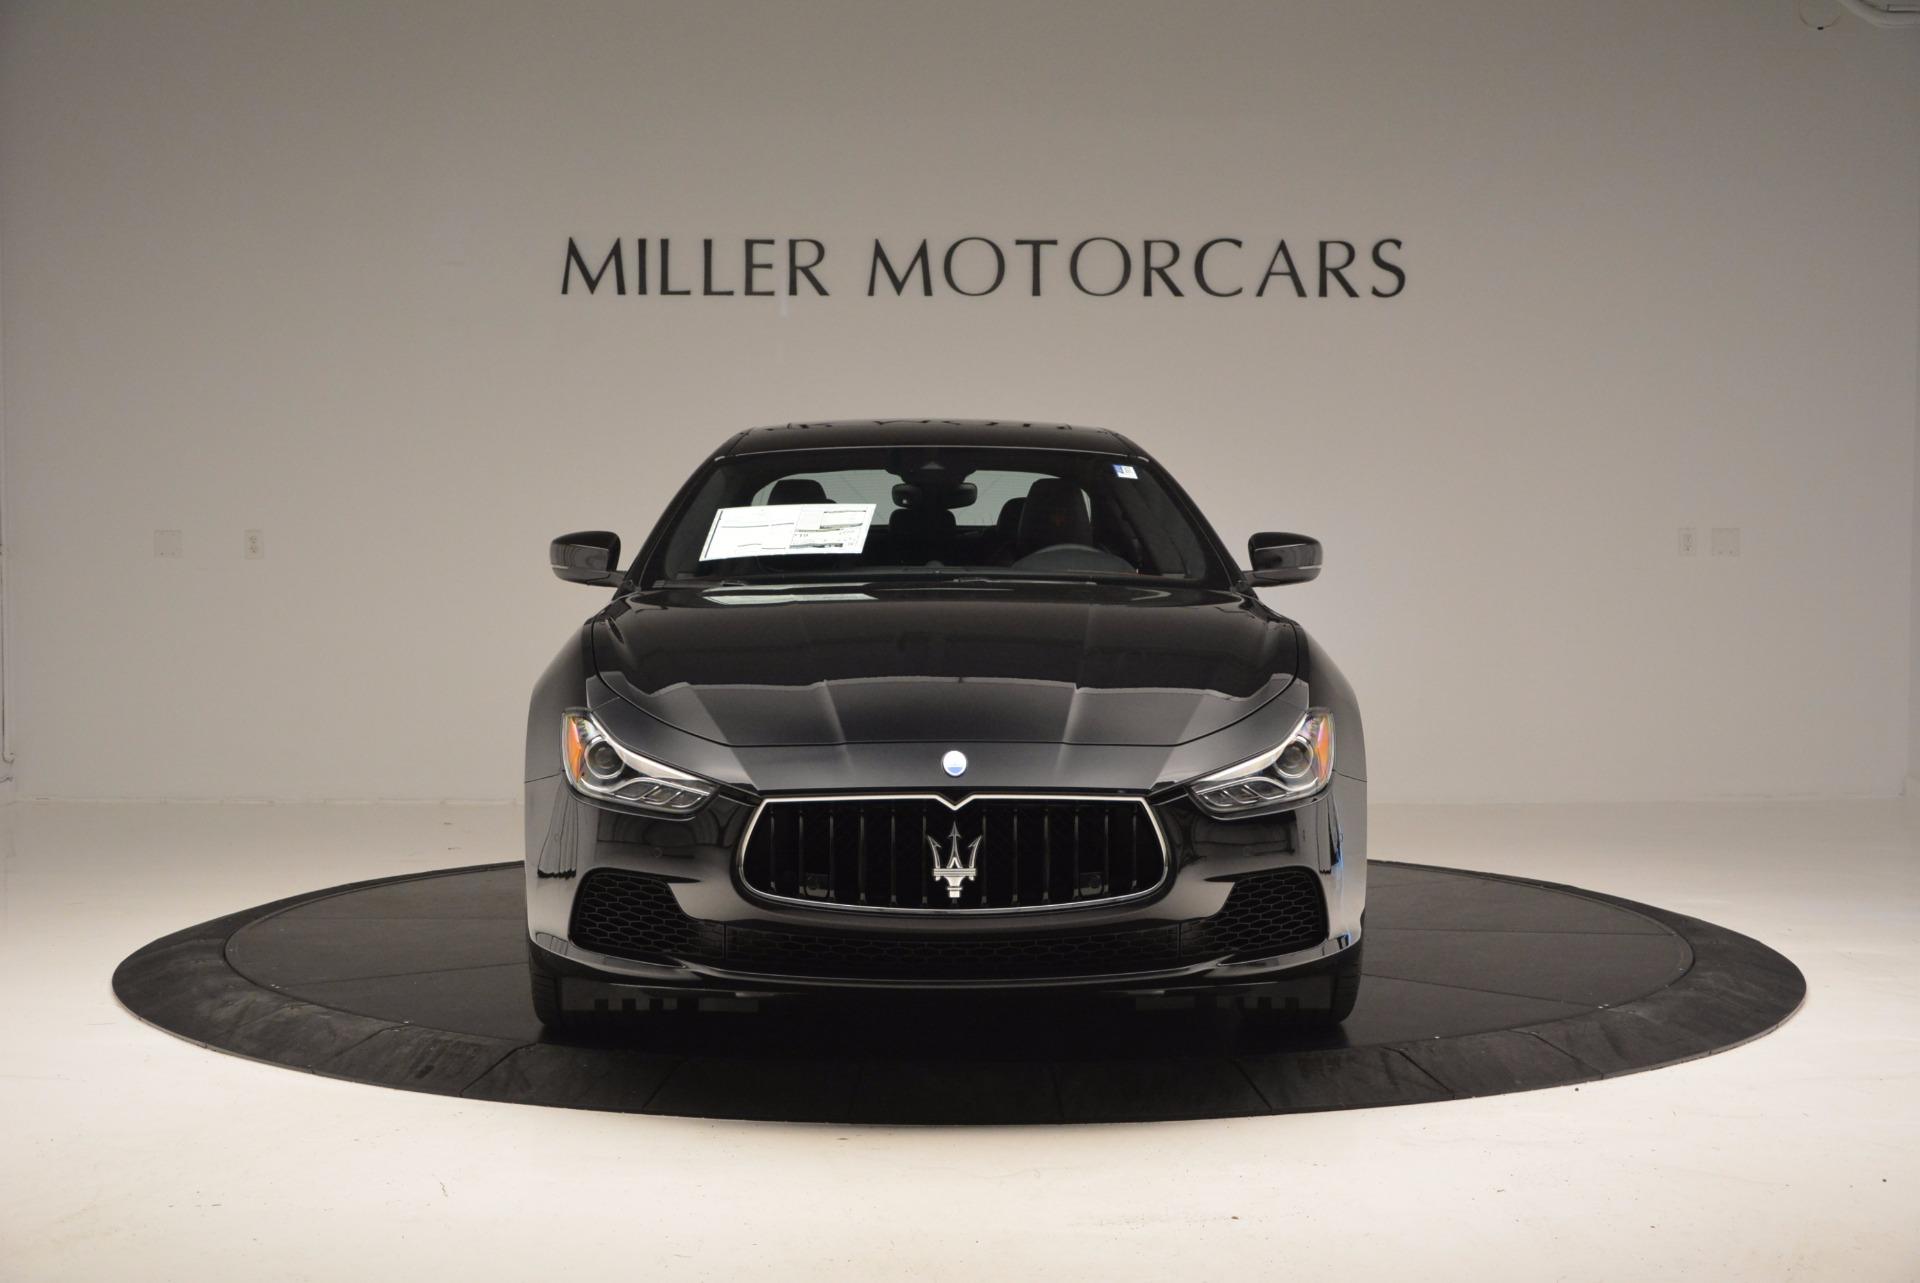 New 2017 Maserati Ghibli SQ4 For Sale In Westport, CT 1108_p12